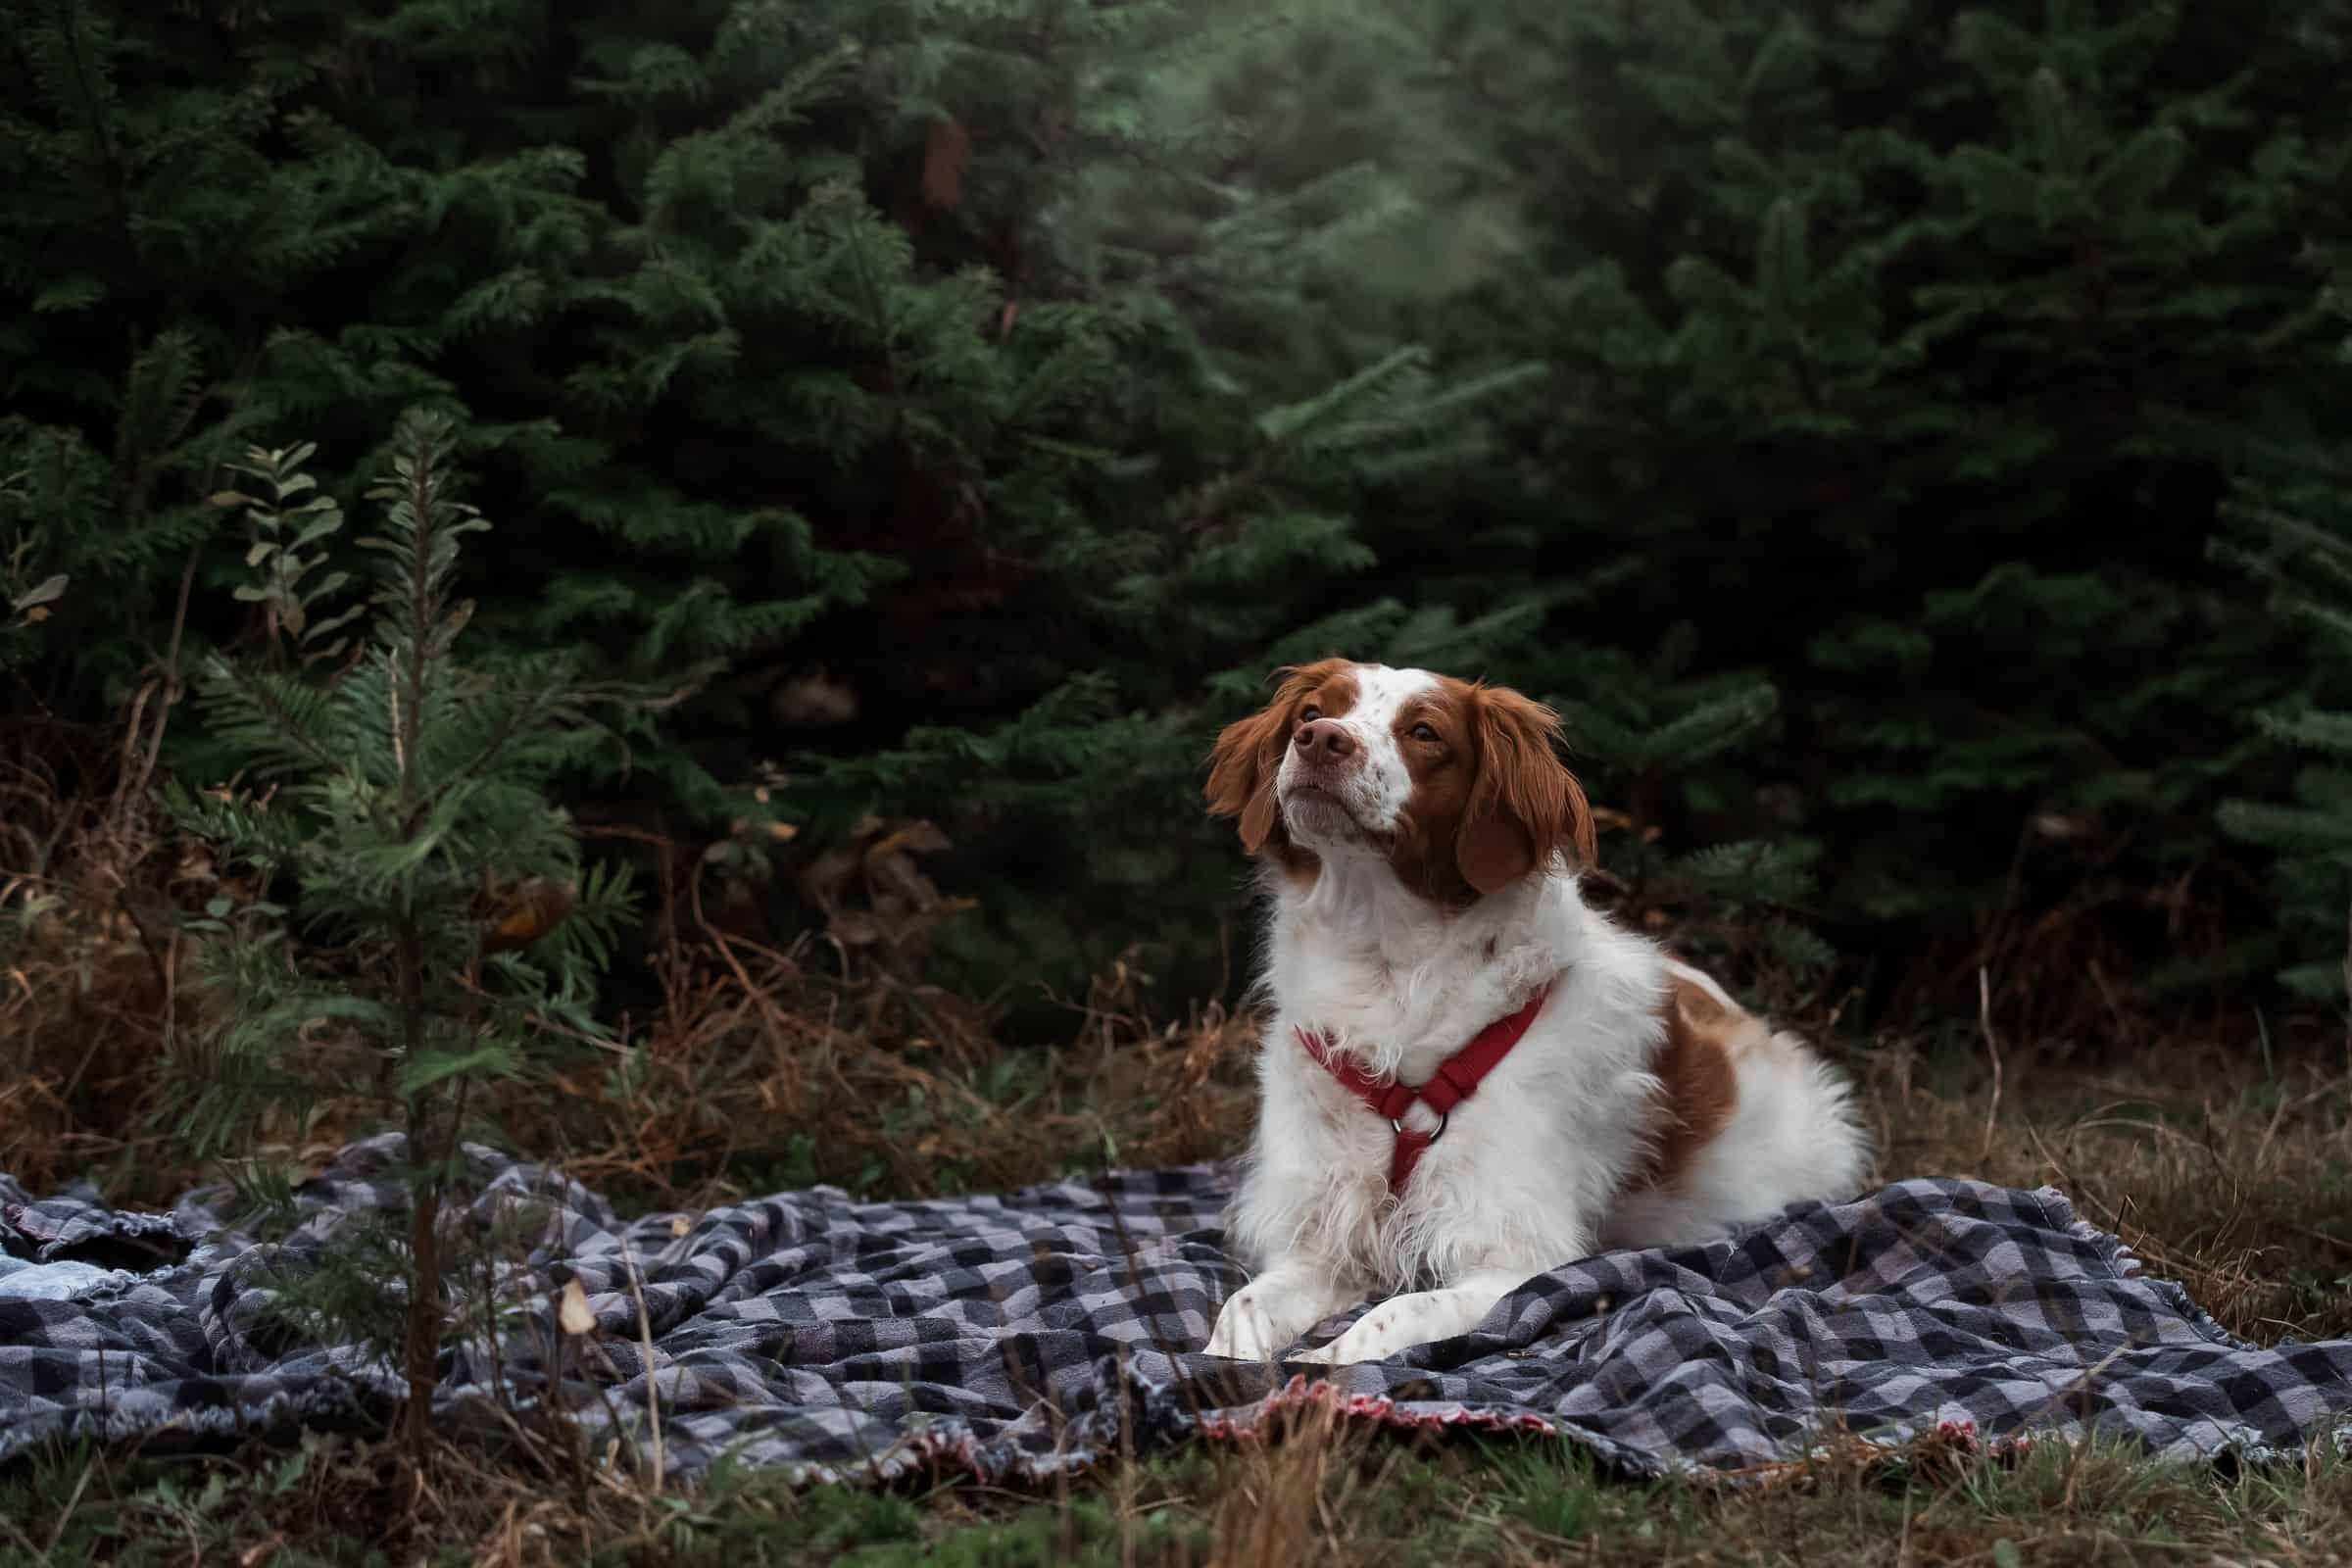 dog on plaid blanket among evergreen trees